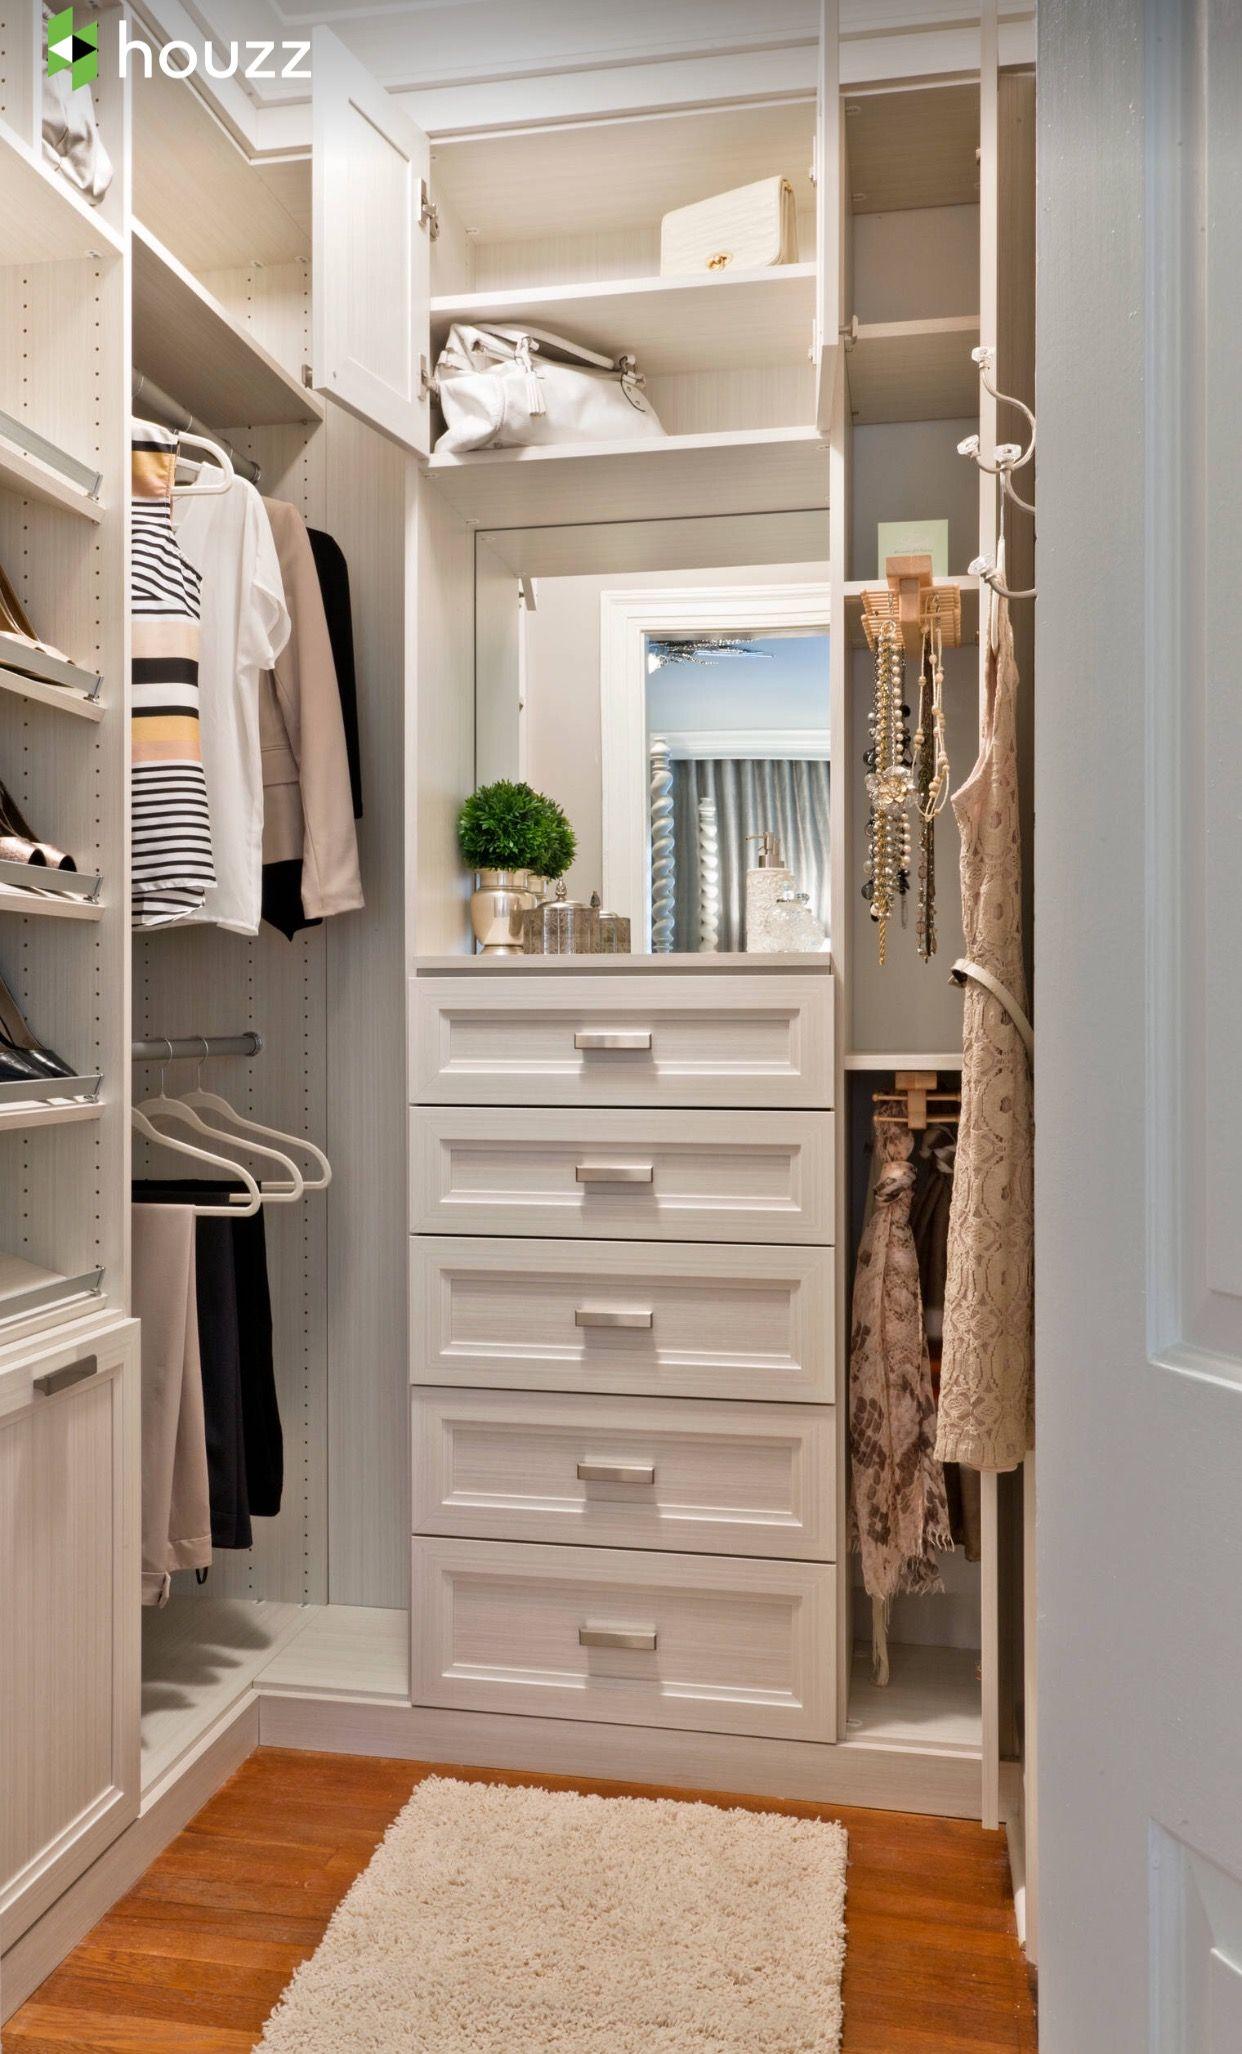 Pin By Vanora Letterpress On House Storage Organization Closet Decor Closet Layout Closet Remodel